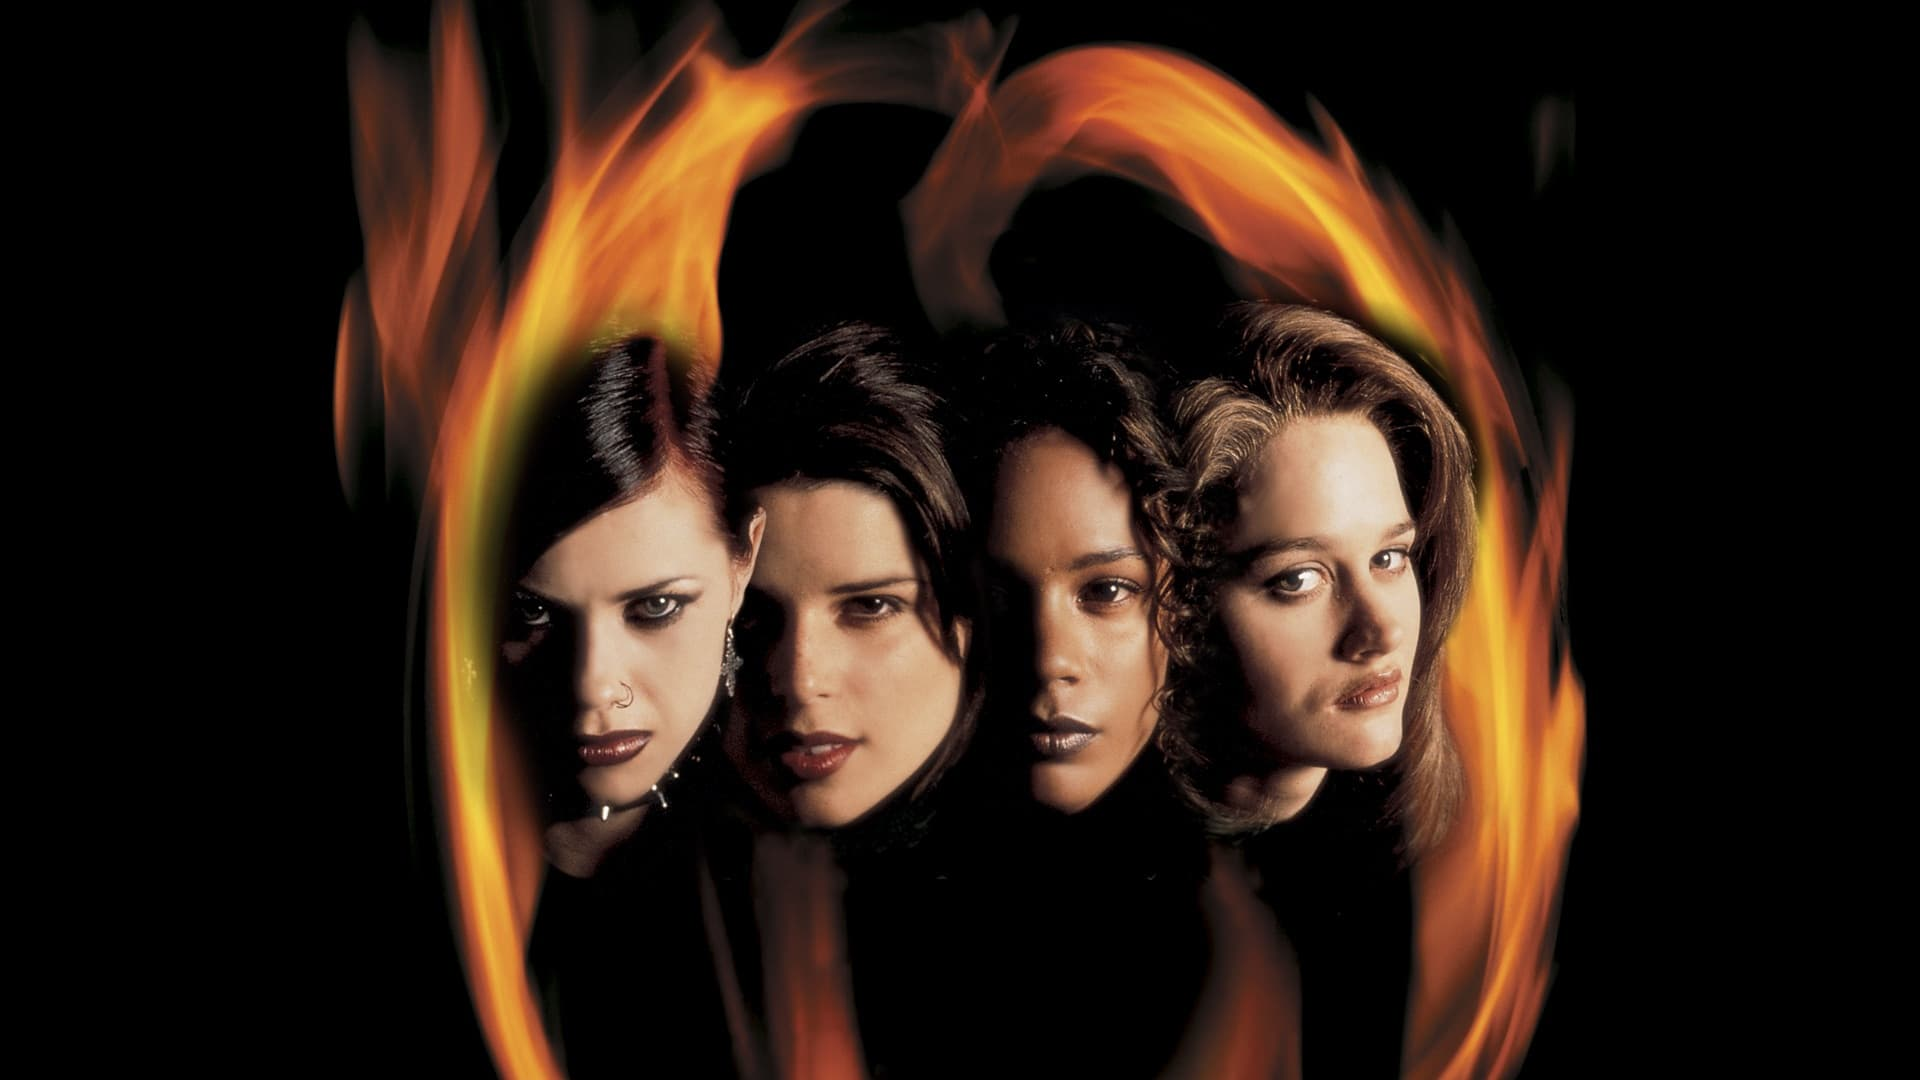 Jóvenes y brujas (1996)